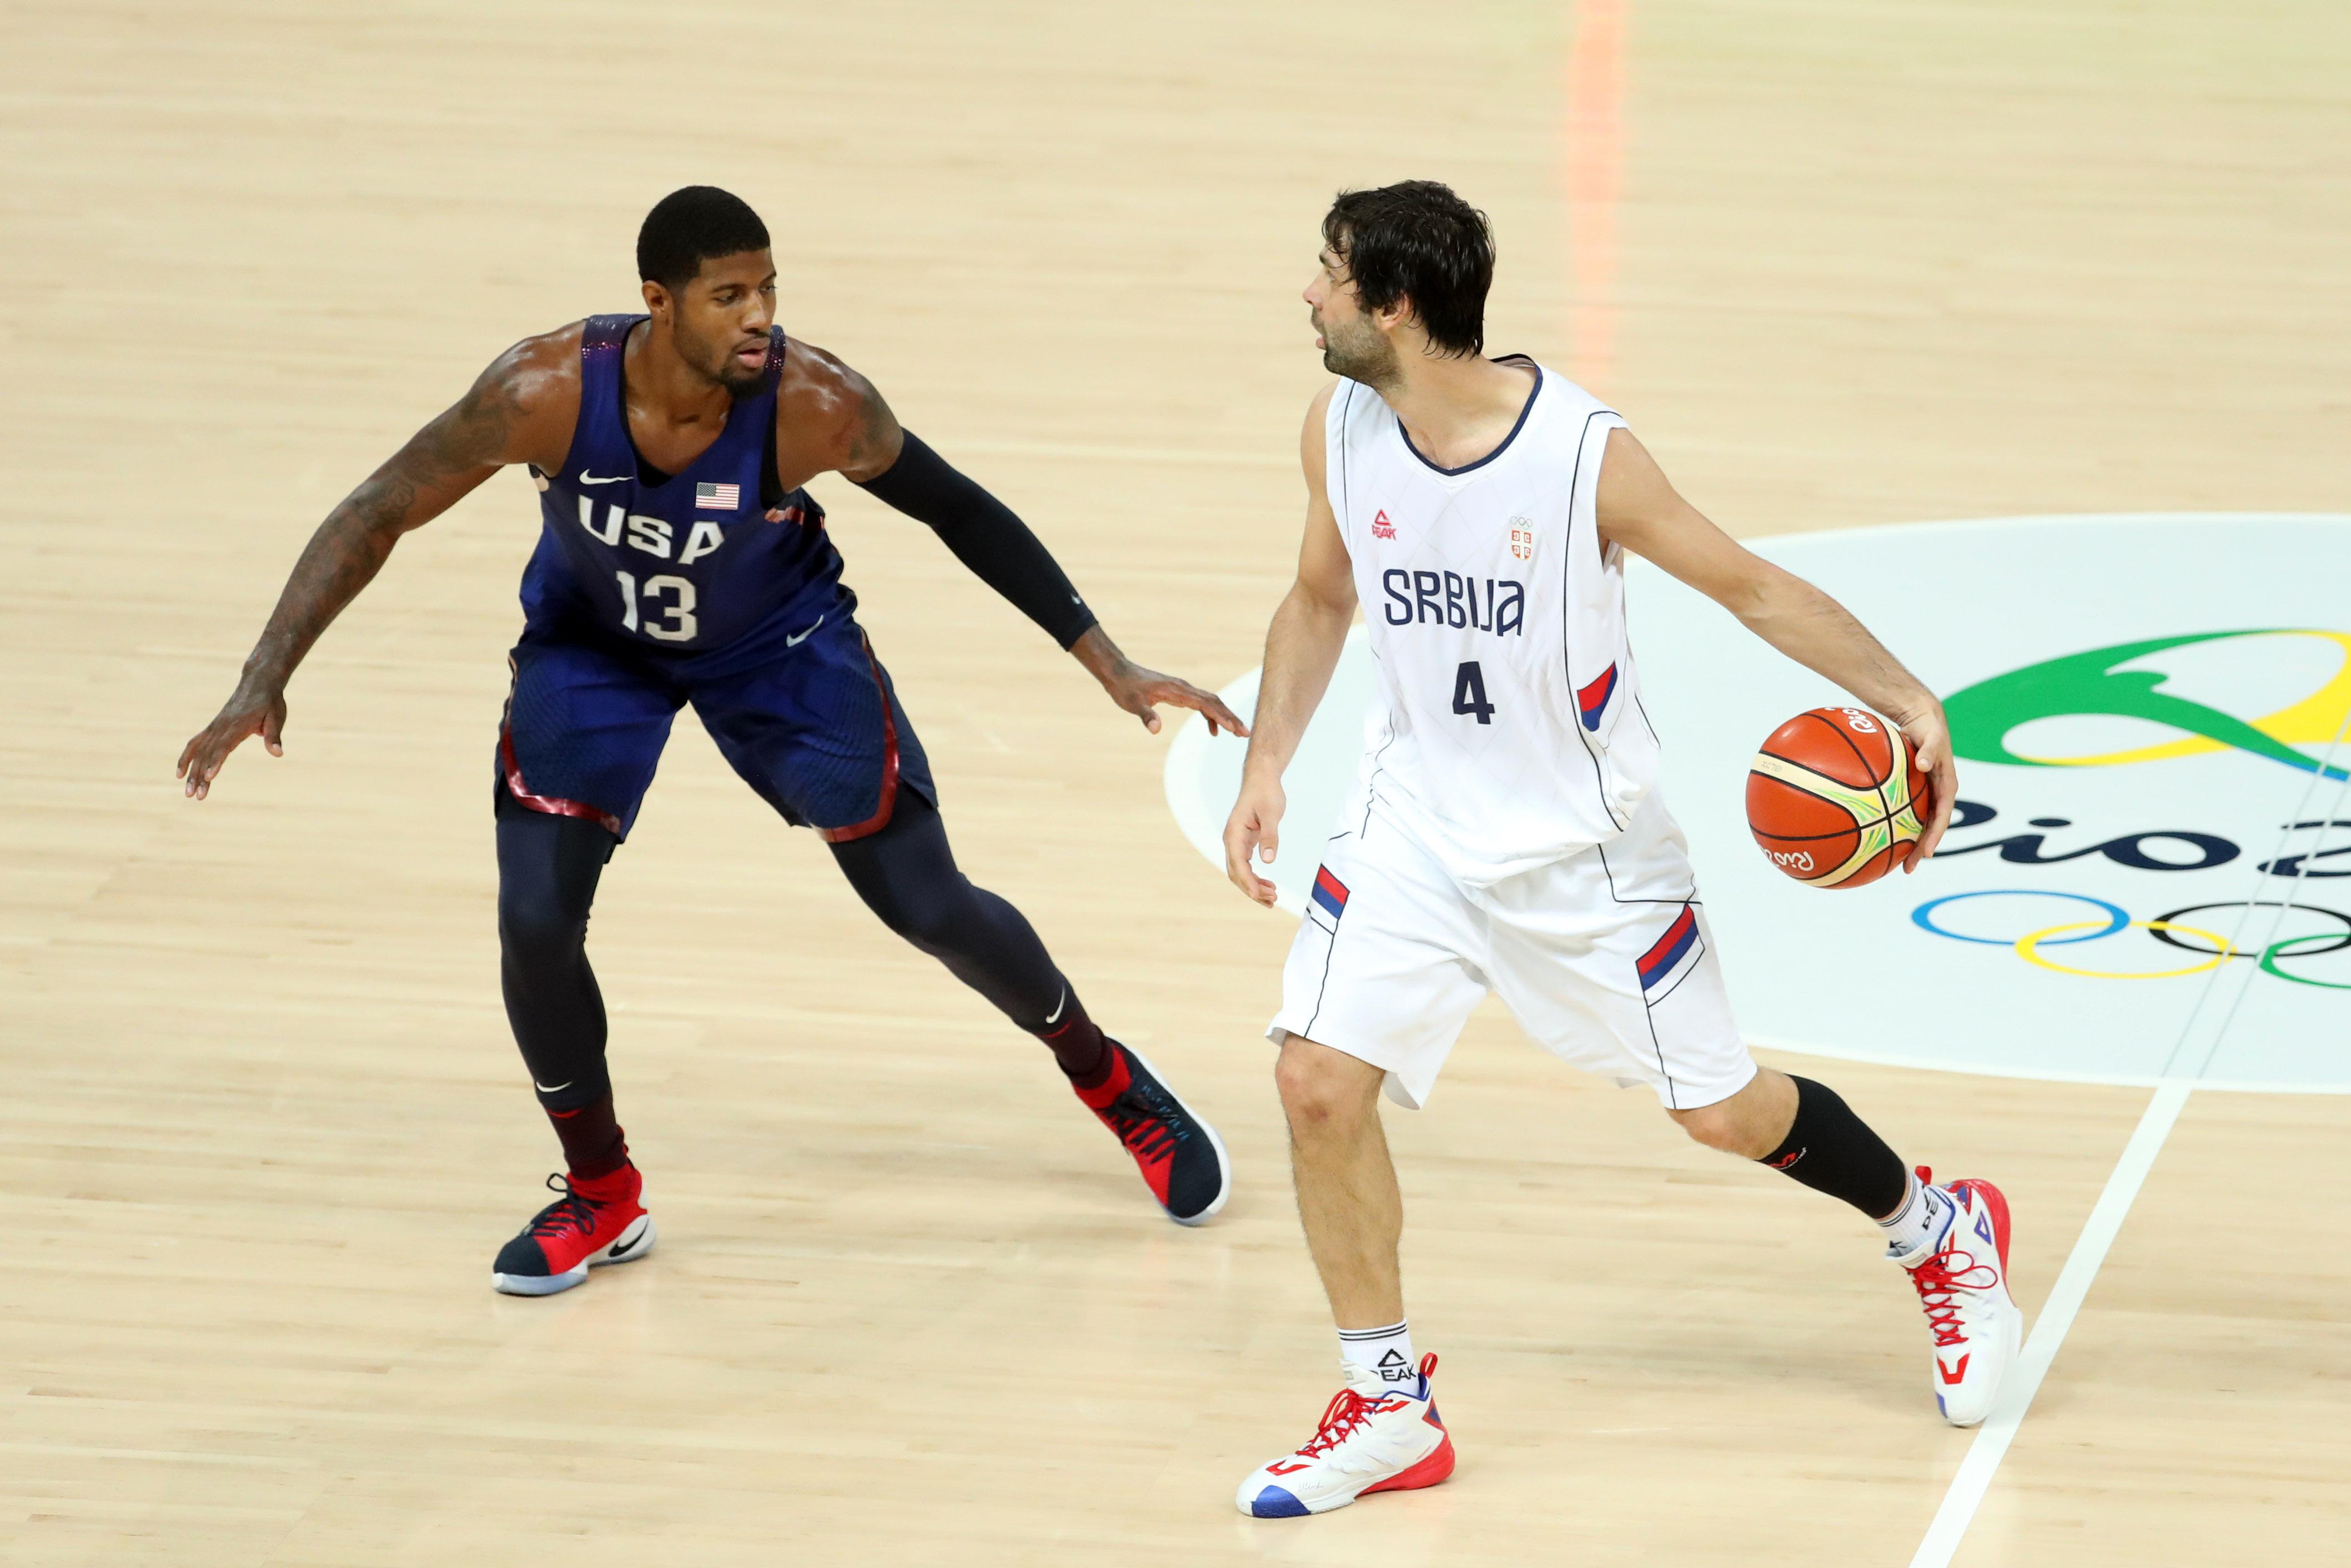 9495679-olympics-basketball-mens-team-final-srb-vs-usa